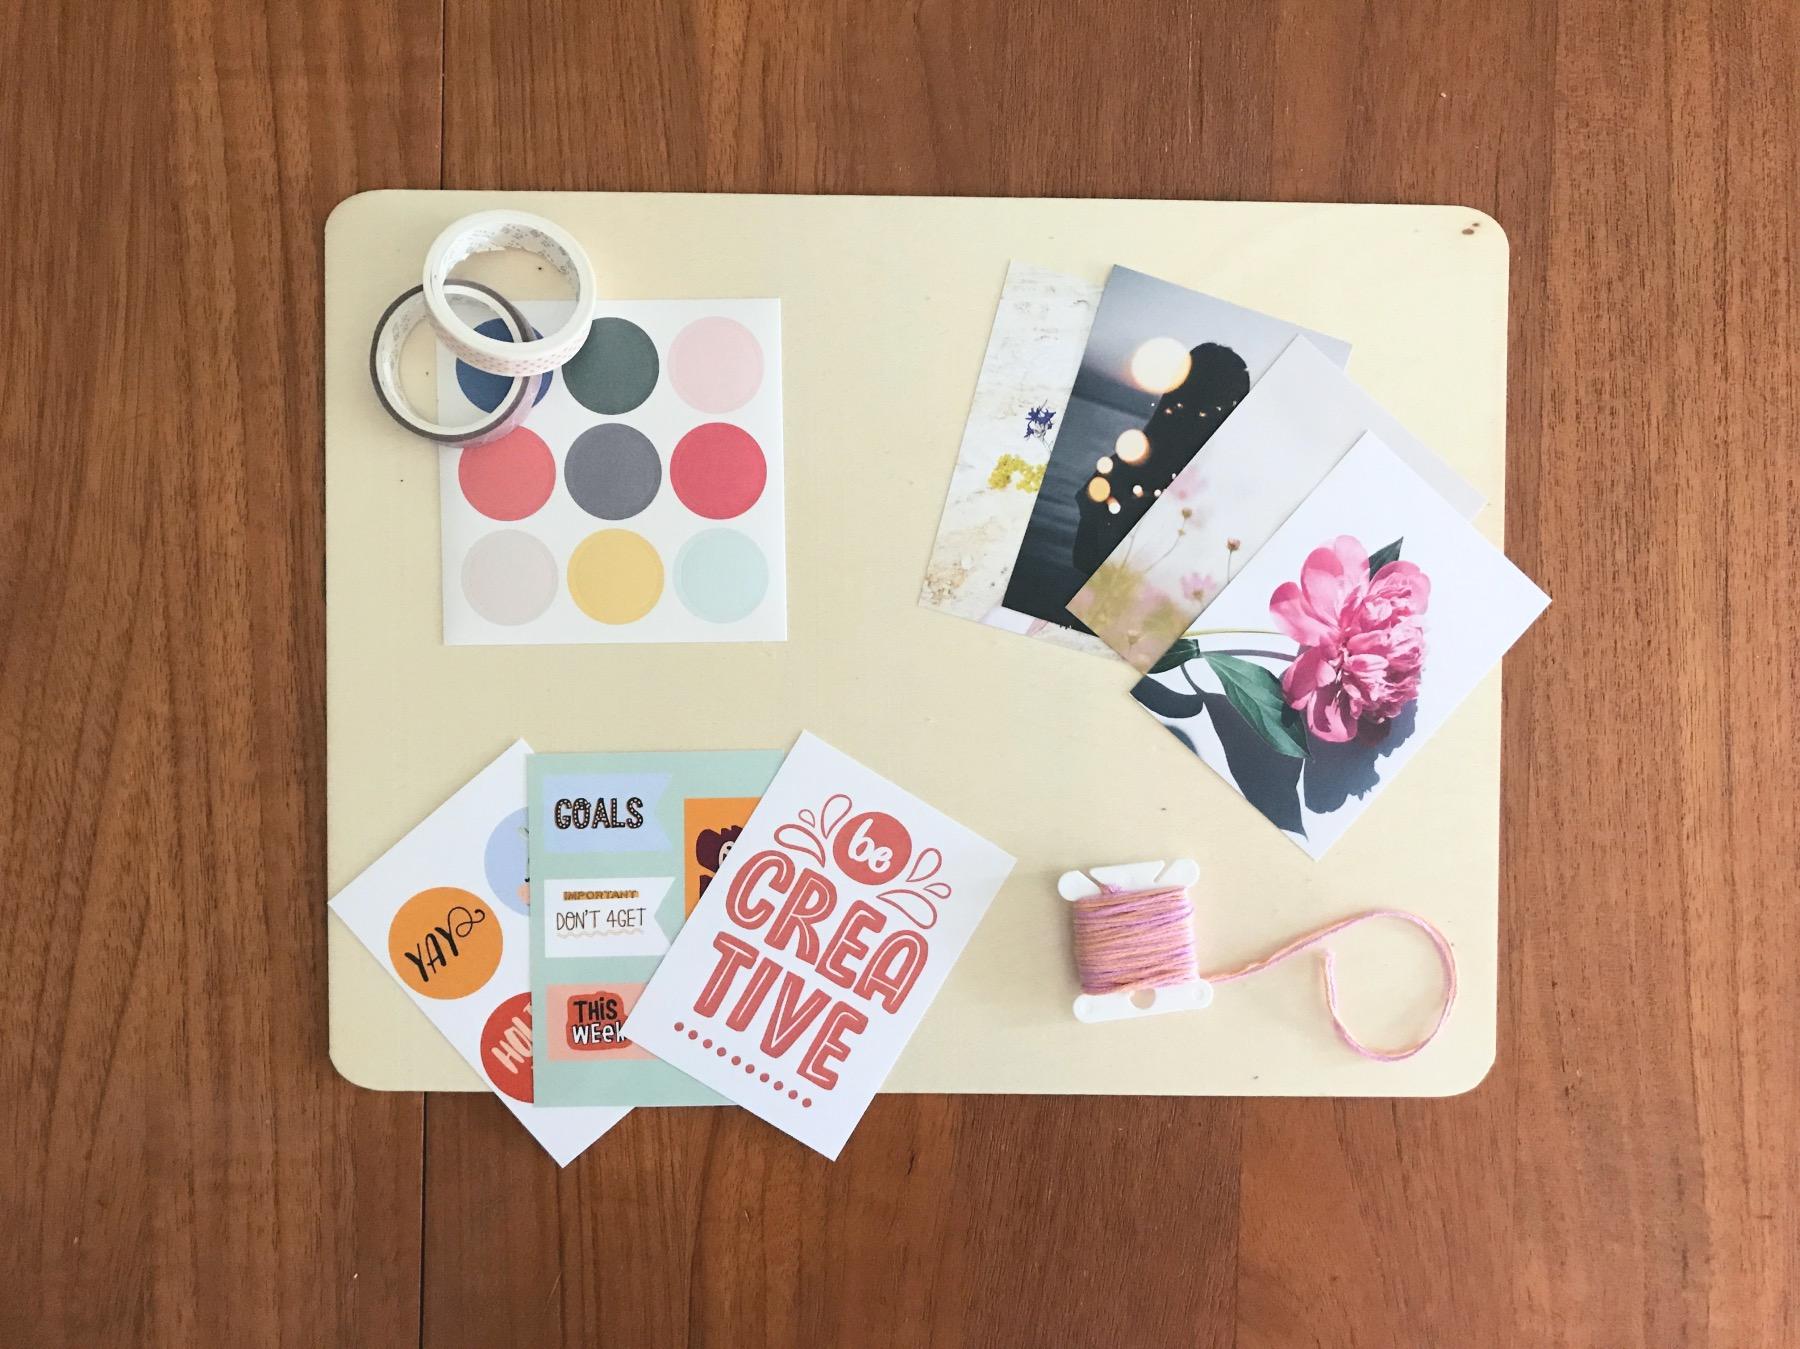 supplies to make a stylish wood vision board